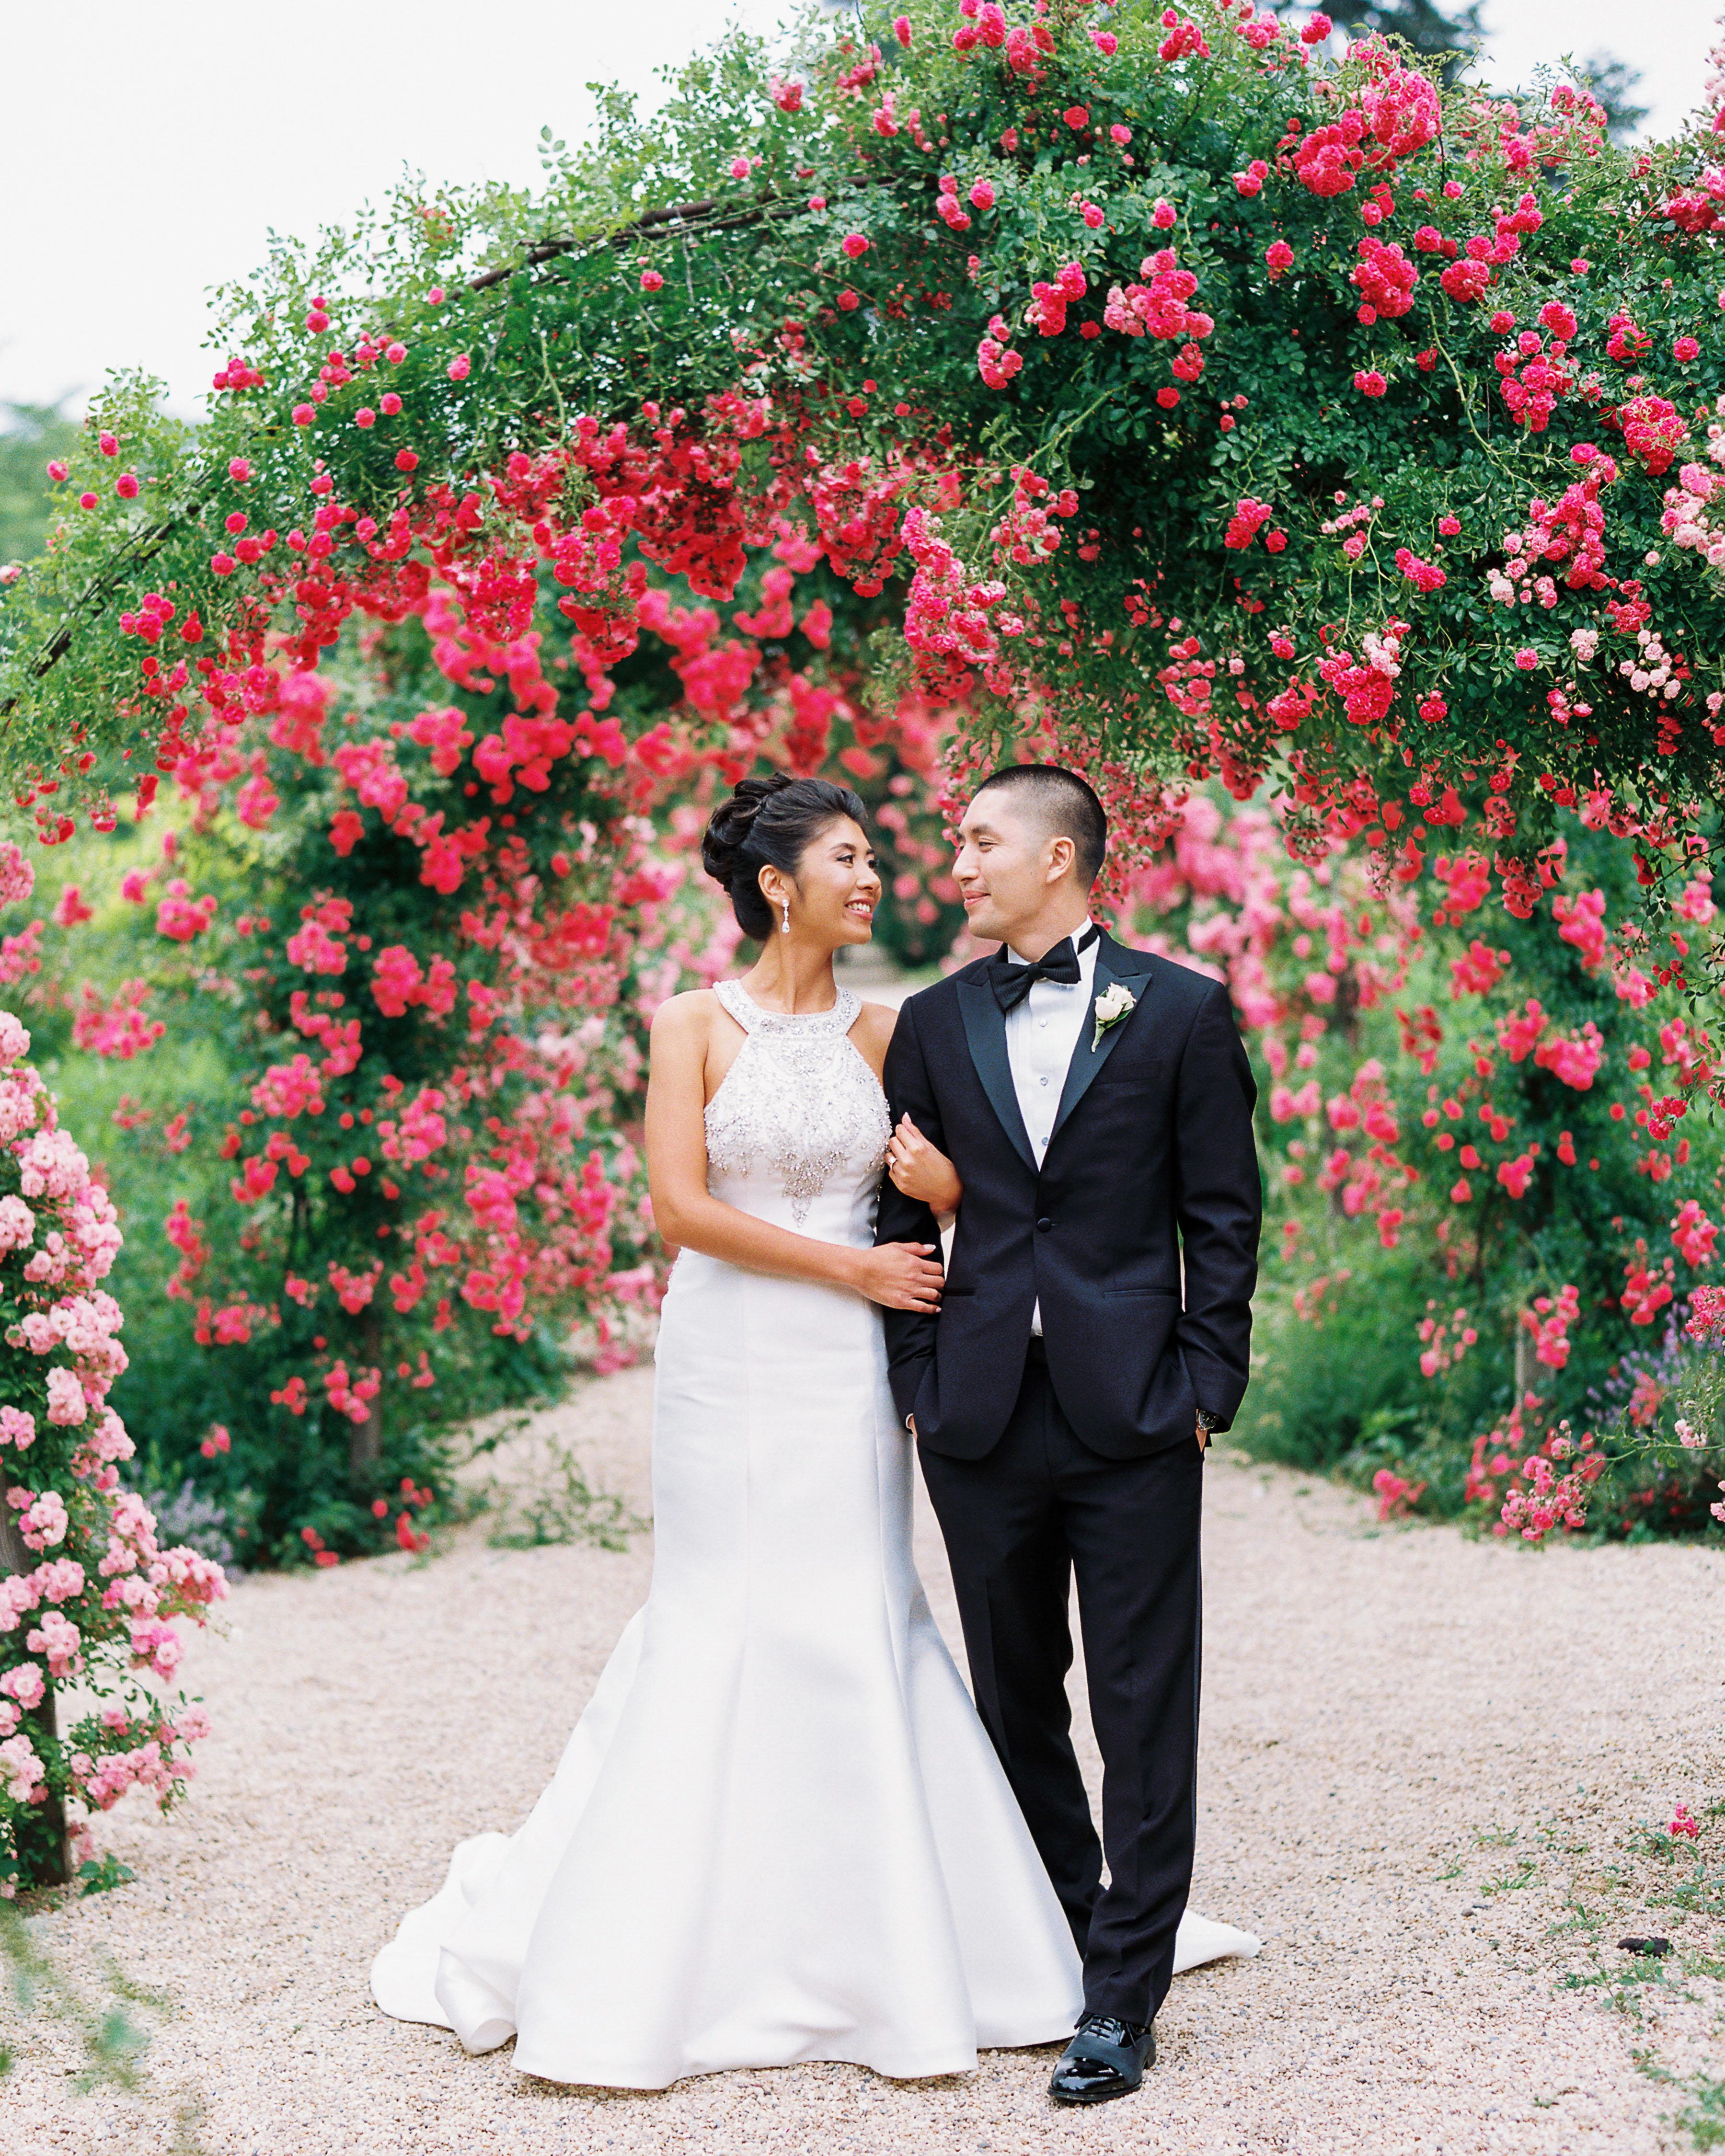 bougainvillea floral arrangements wedding backdrop